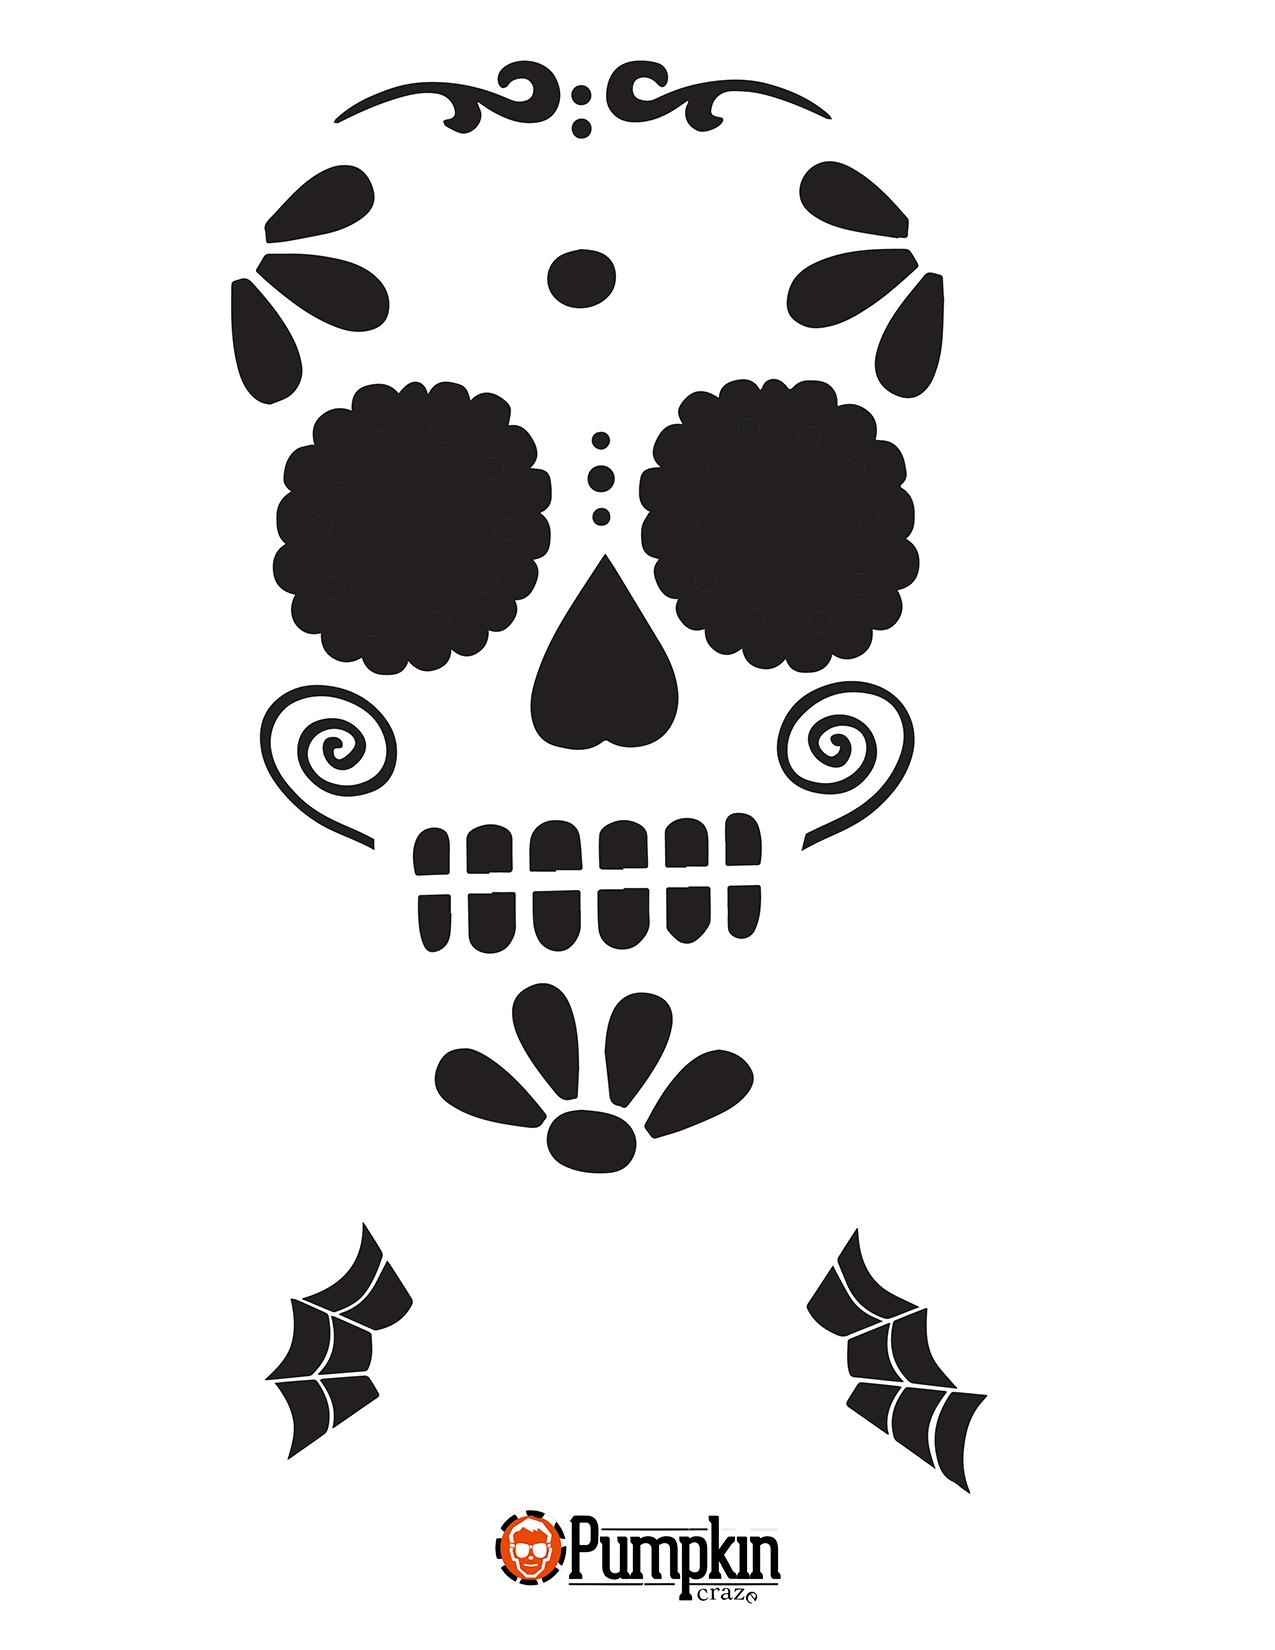 looking for free pumpkin patterns you can find easy free rh pinterest com sugar skull pumpkin stencil free sugar skull pumpkin stencils free printable